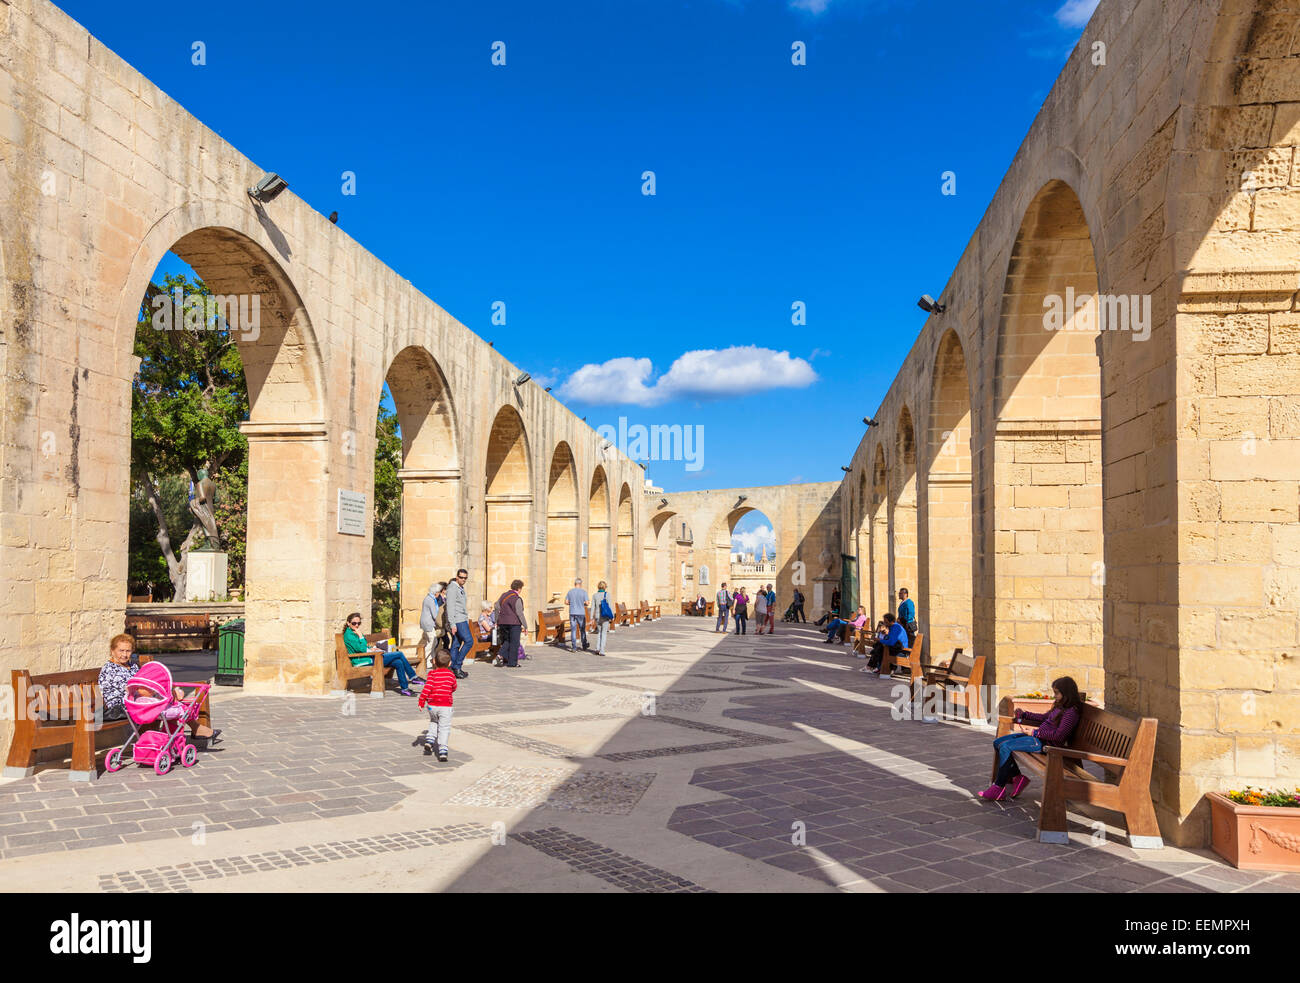 Tourists in Upper Barrakka Gardens overlooking the Grand Harbour Valletta Malta EU Europe - Stock Image